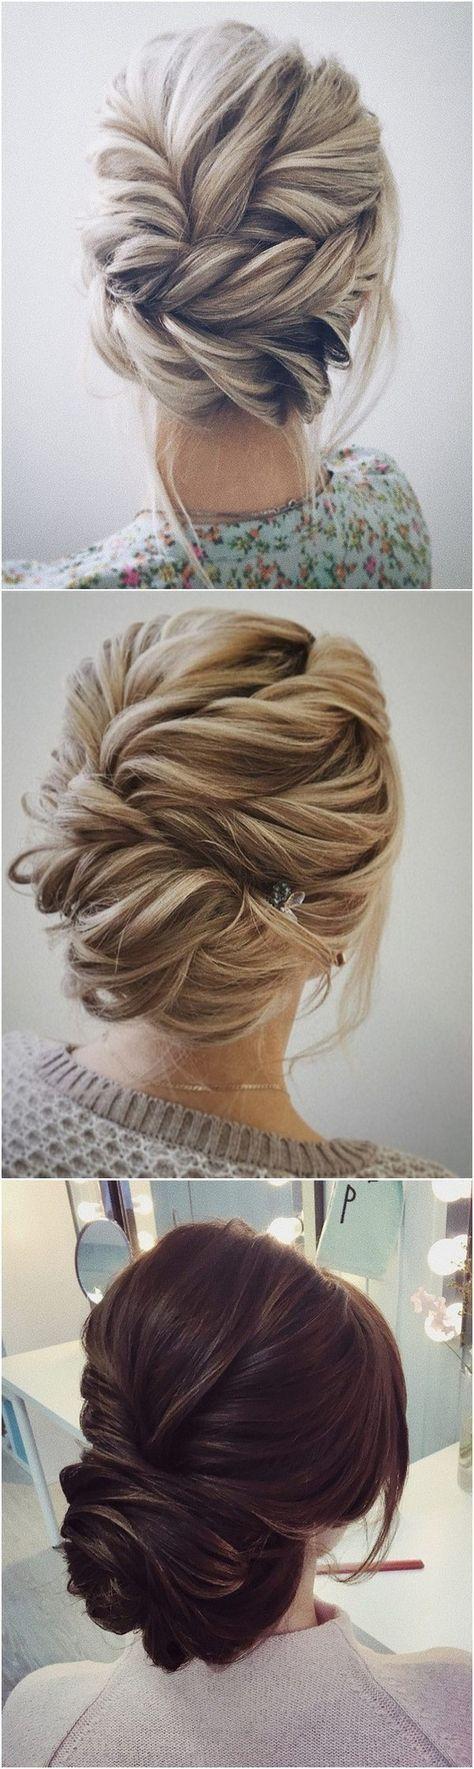 pin by agnieszka on hair | pinterest | updos